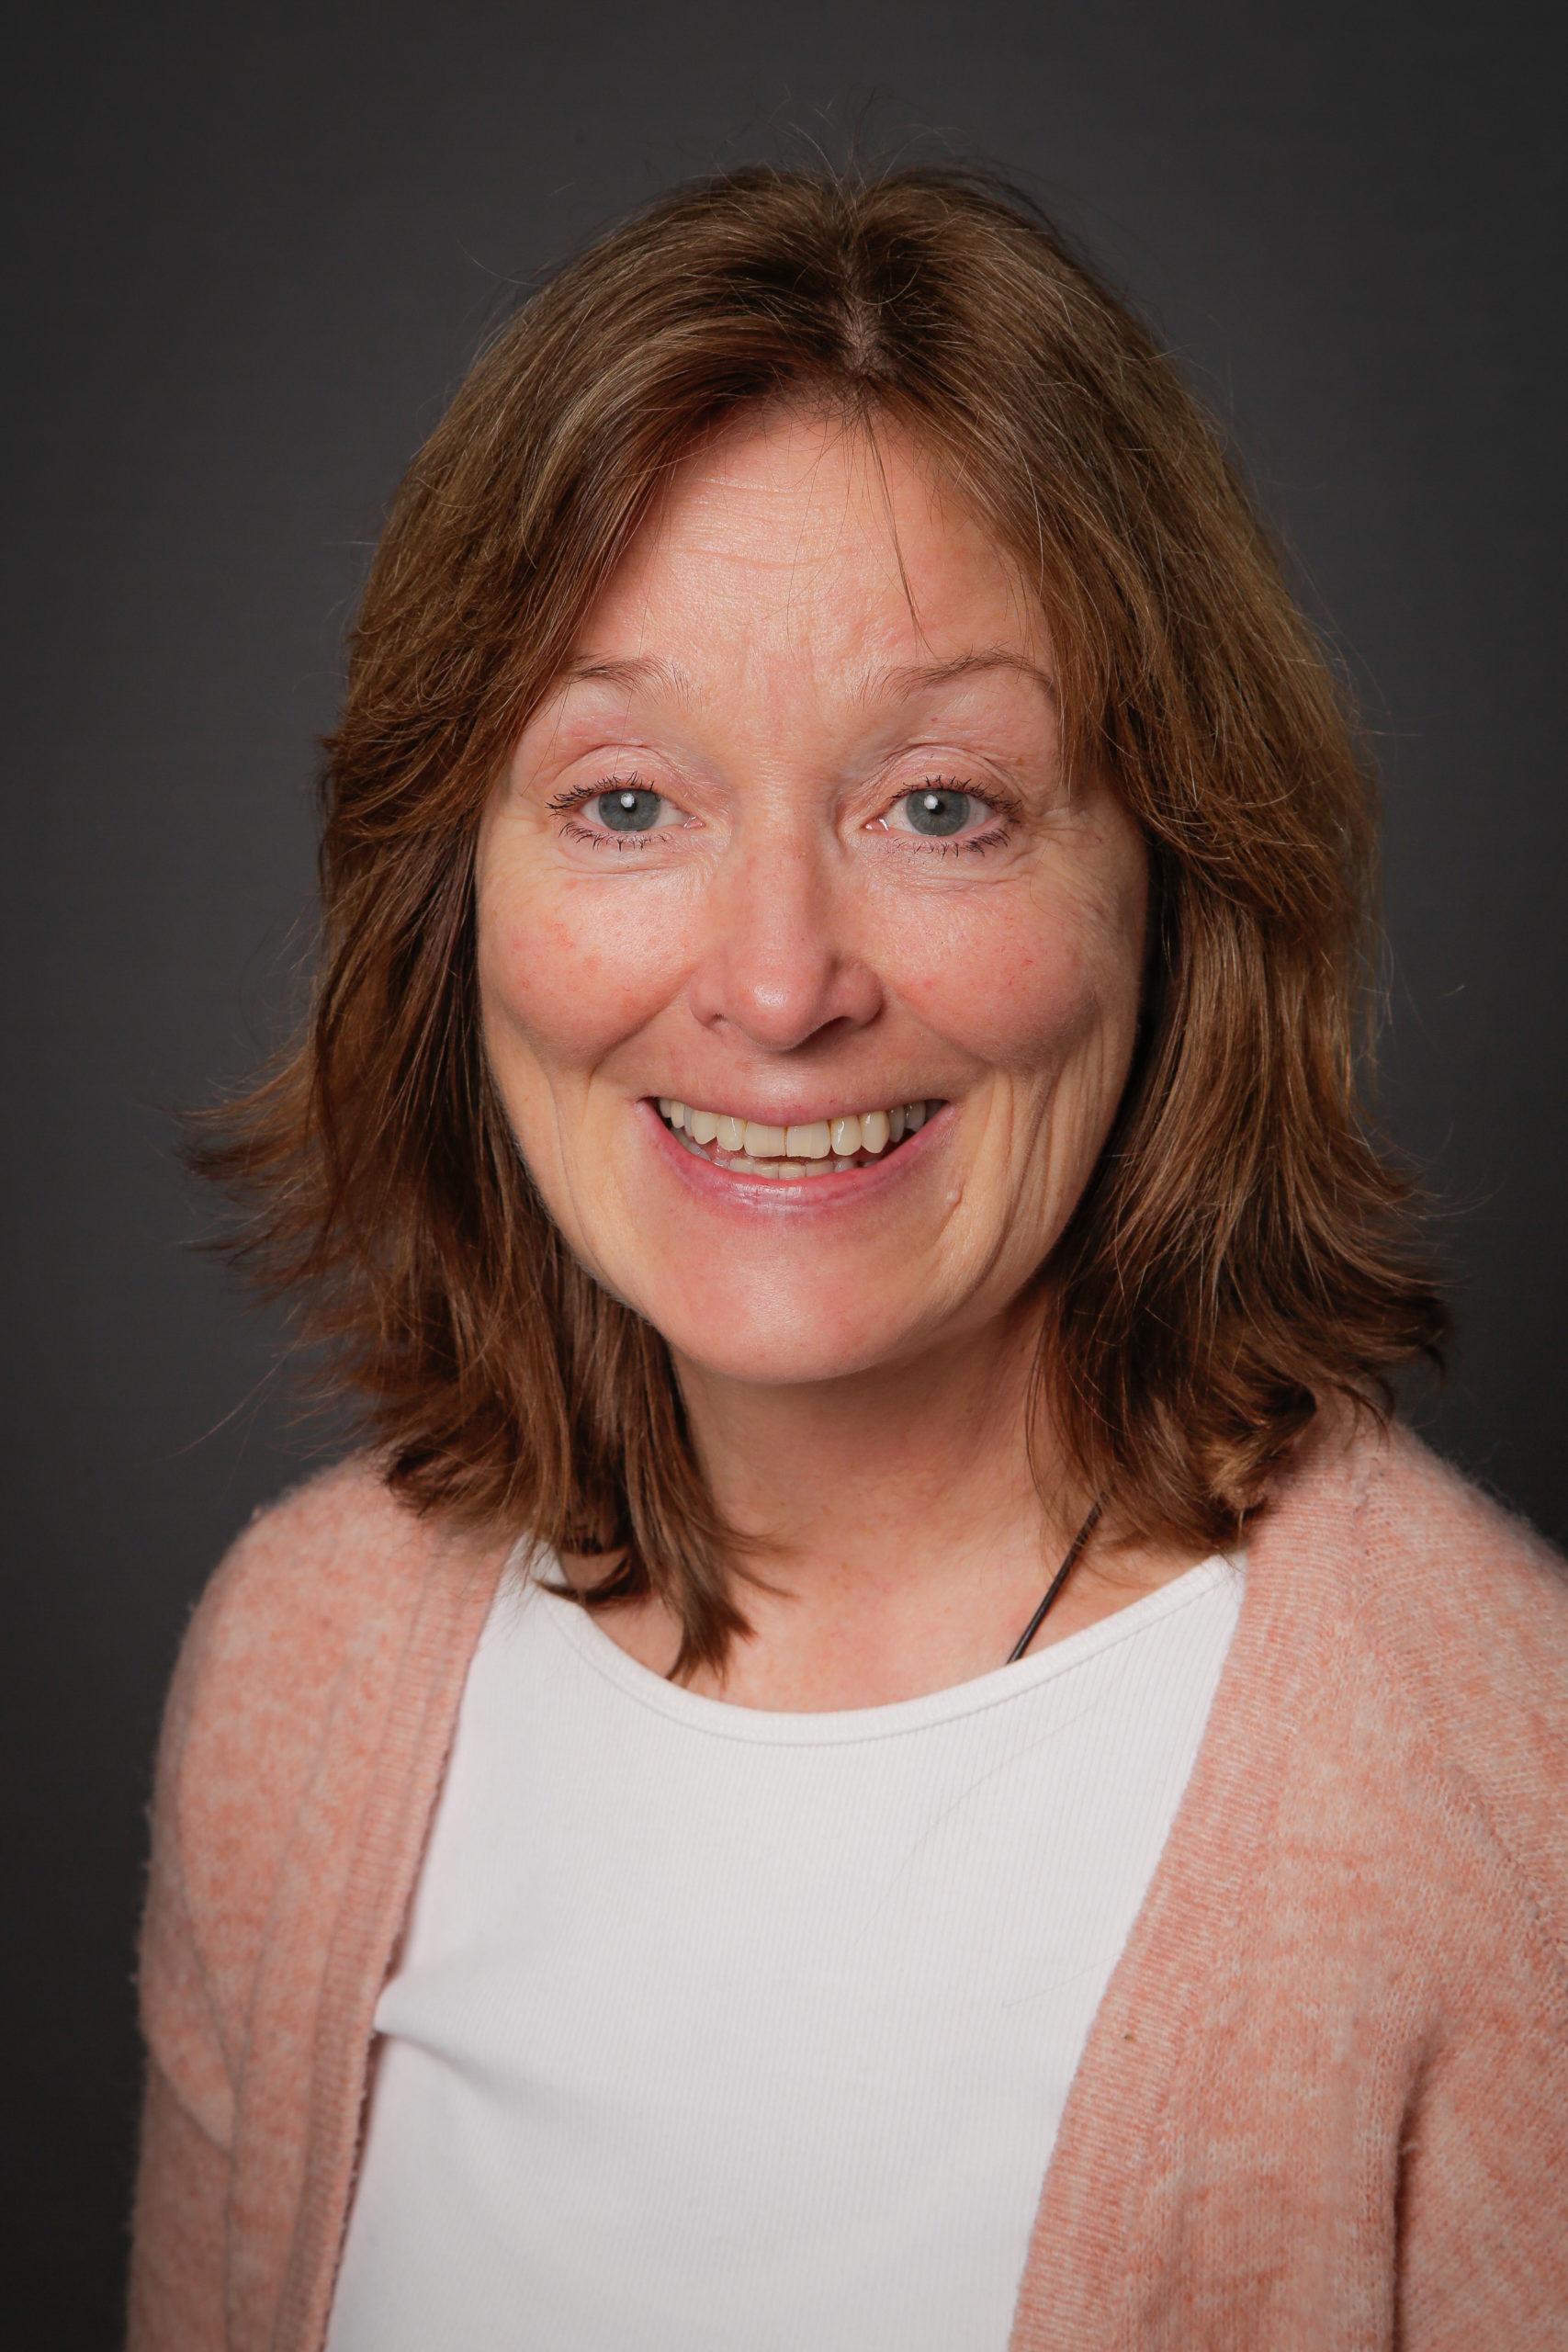 Anne Cathrine Brøvig